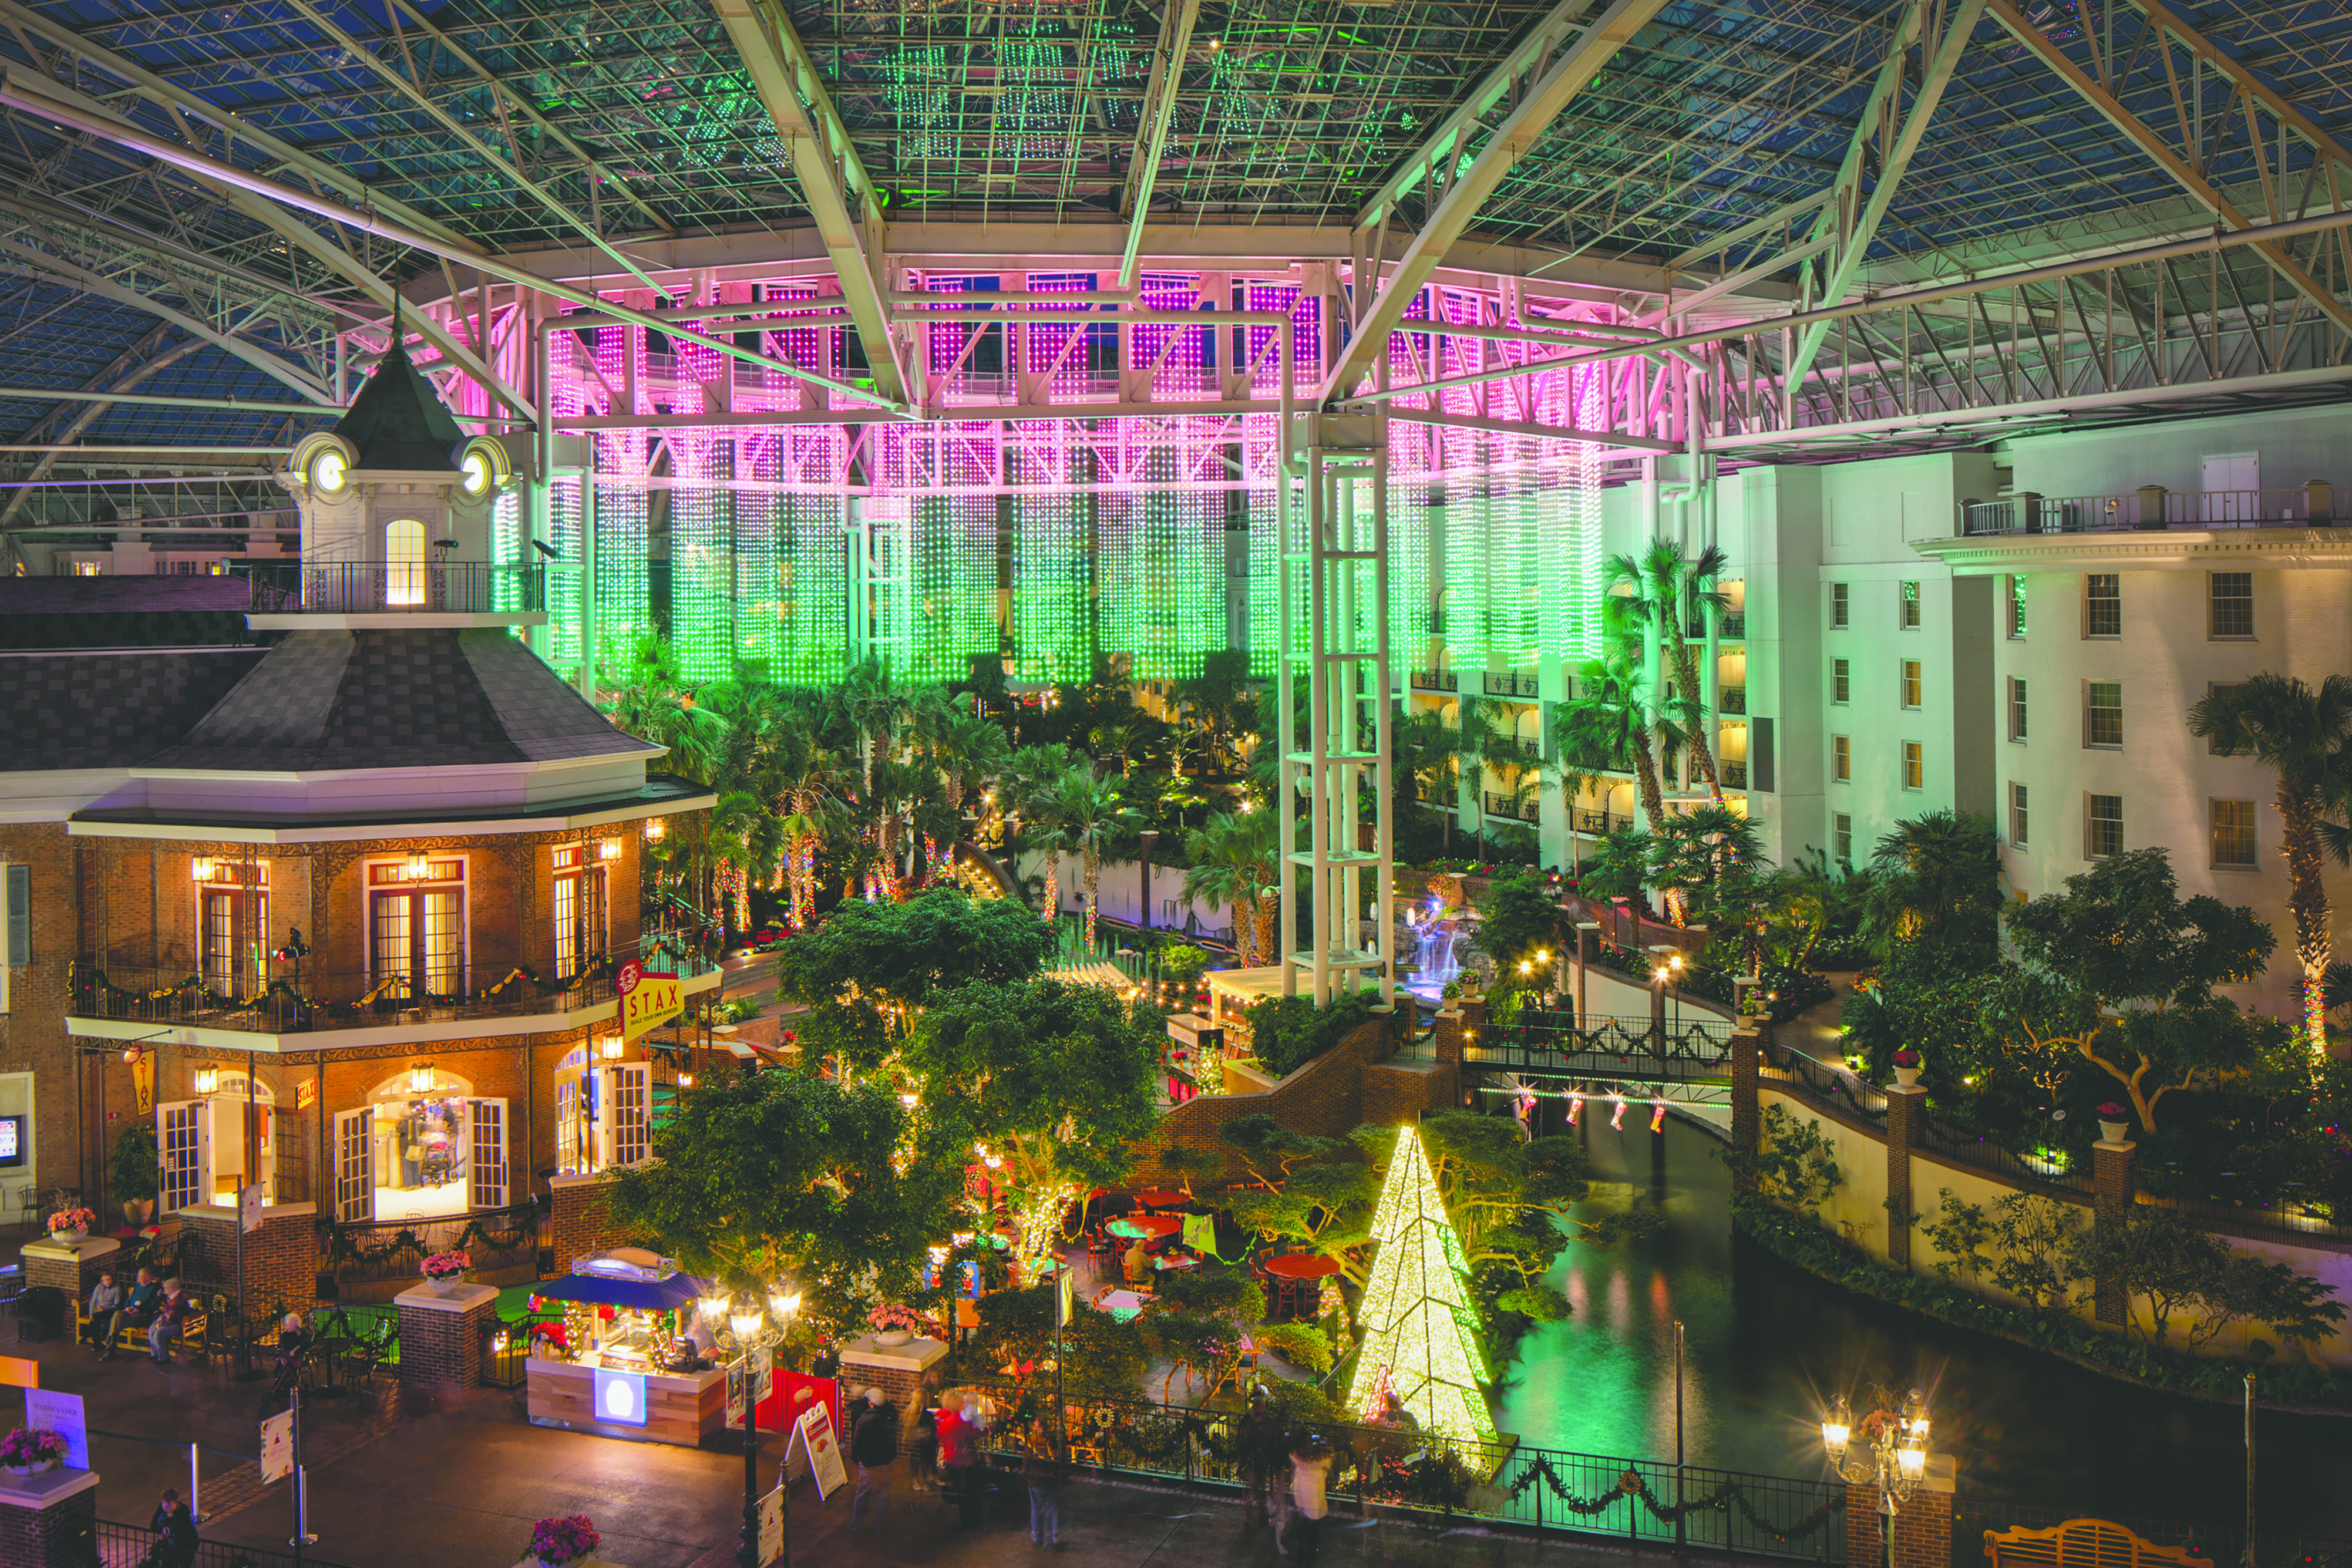 gaylord opryland resort convention center in nashville jpg 4005x2670 gaylord opryland hotel christmas